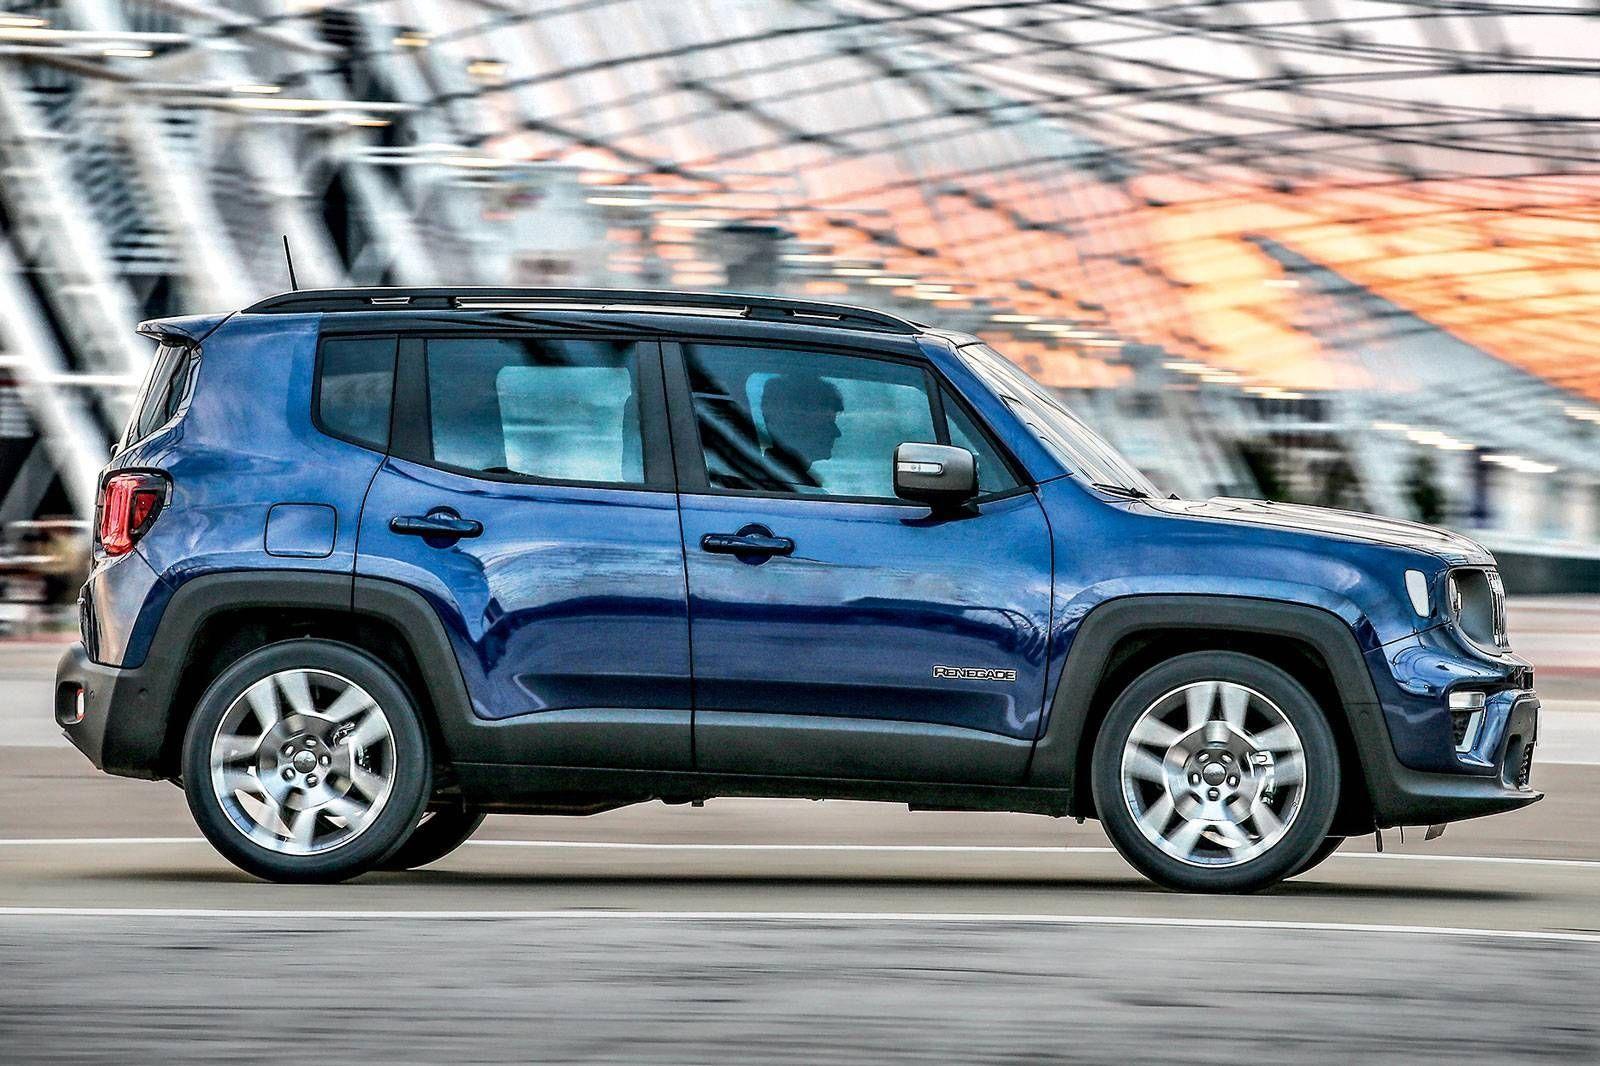 Jeep Renegade Limited Jeeprenegade Jeep Renegade Jeep Jeep Renegade Trailhawk